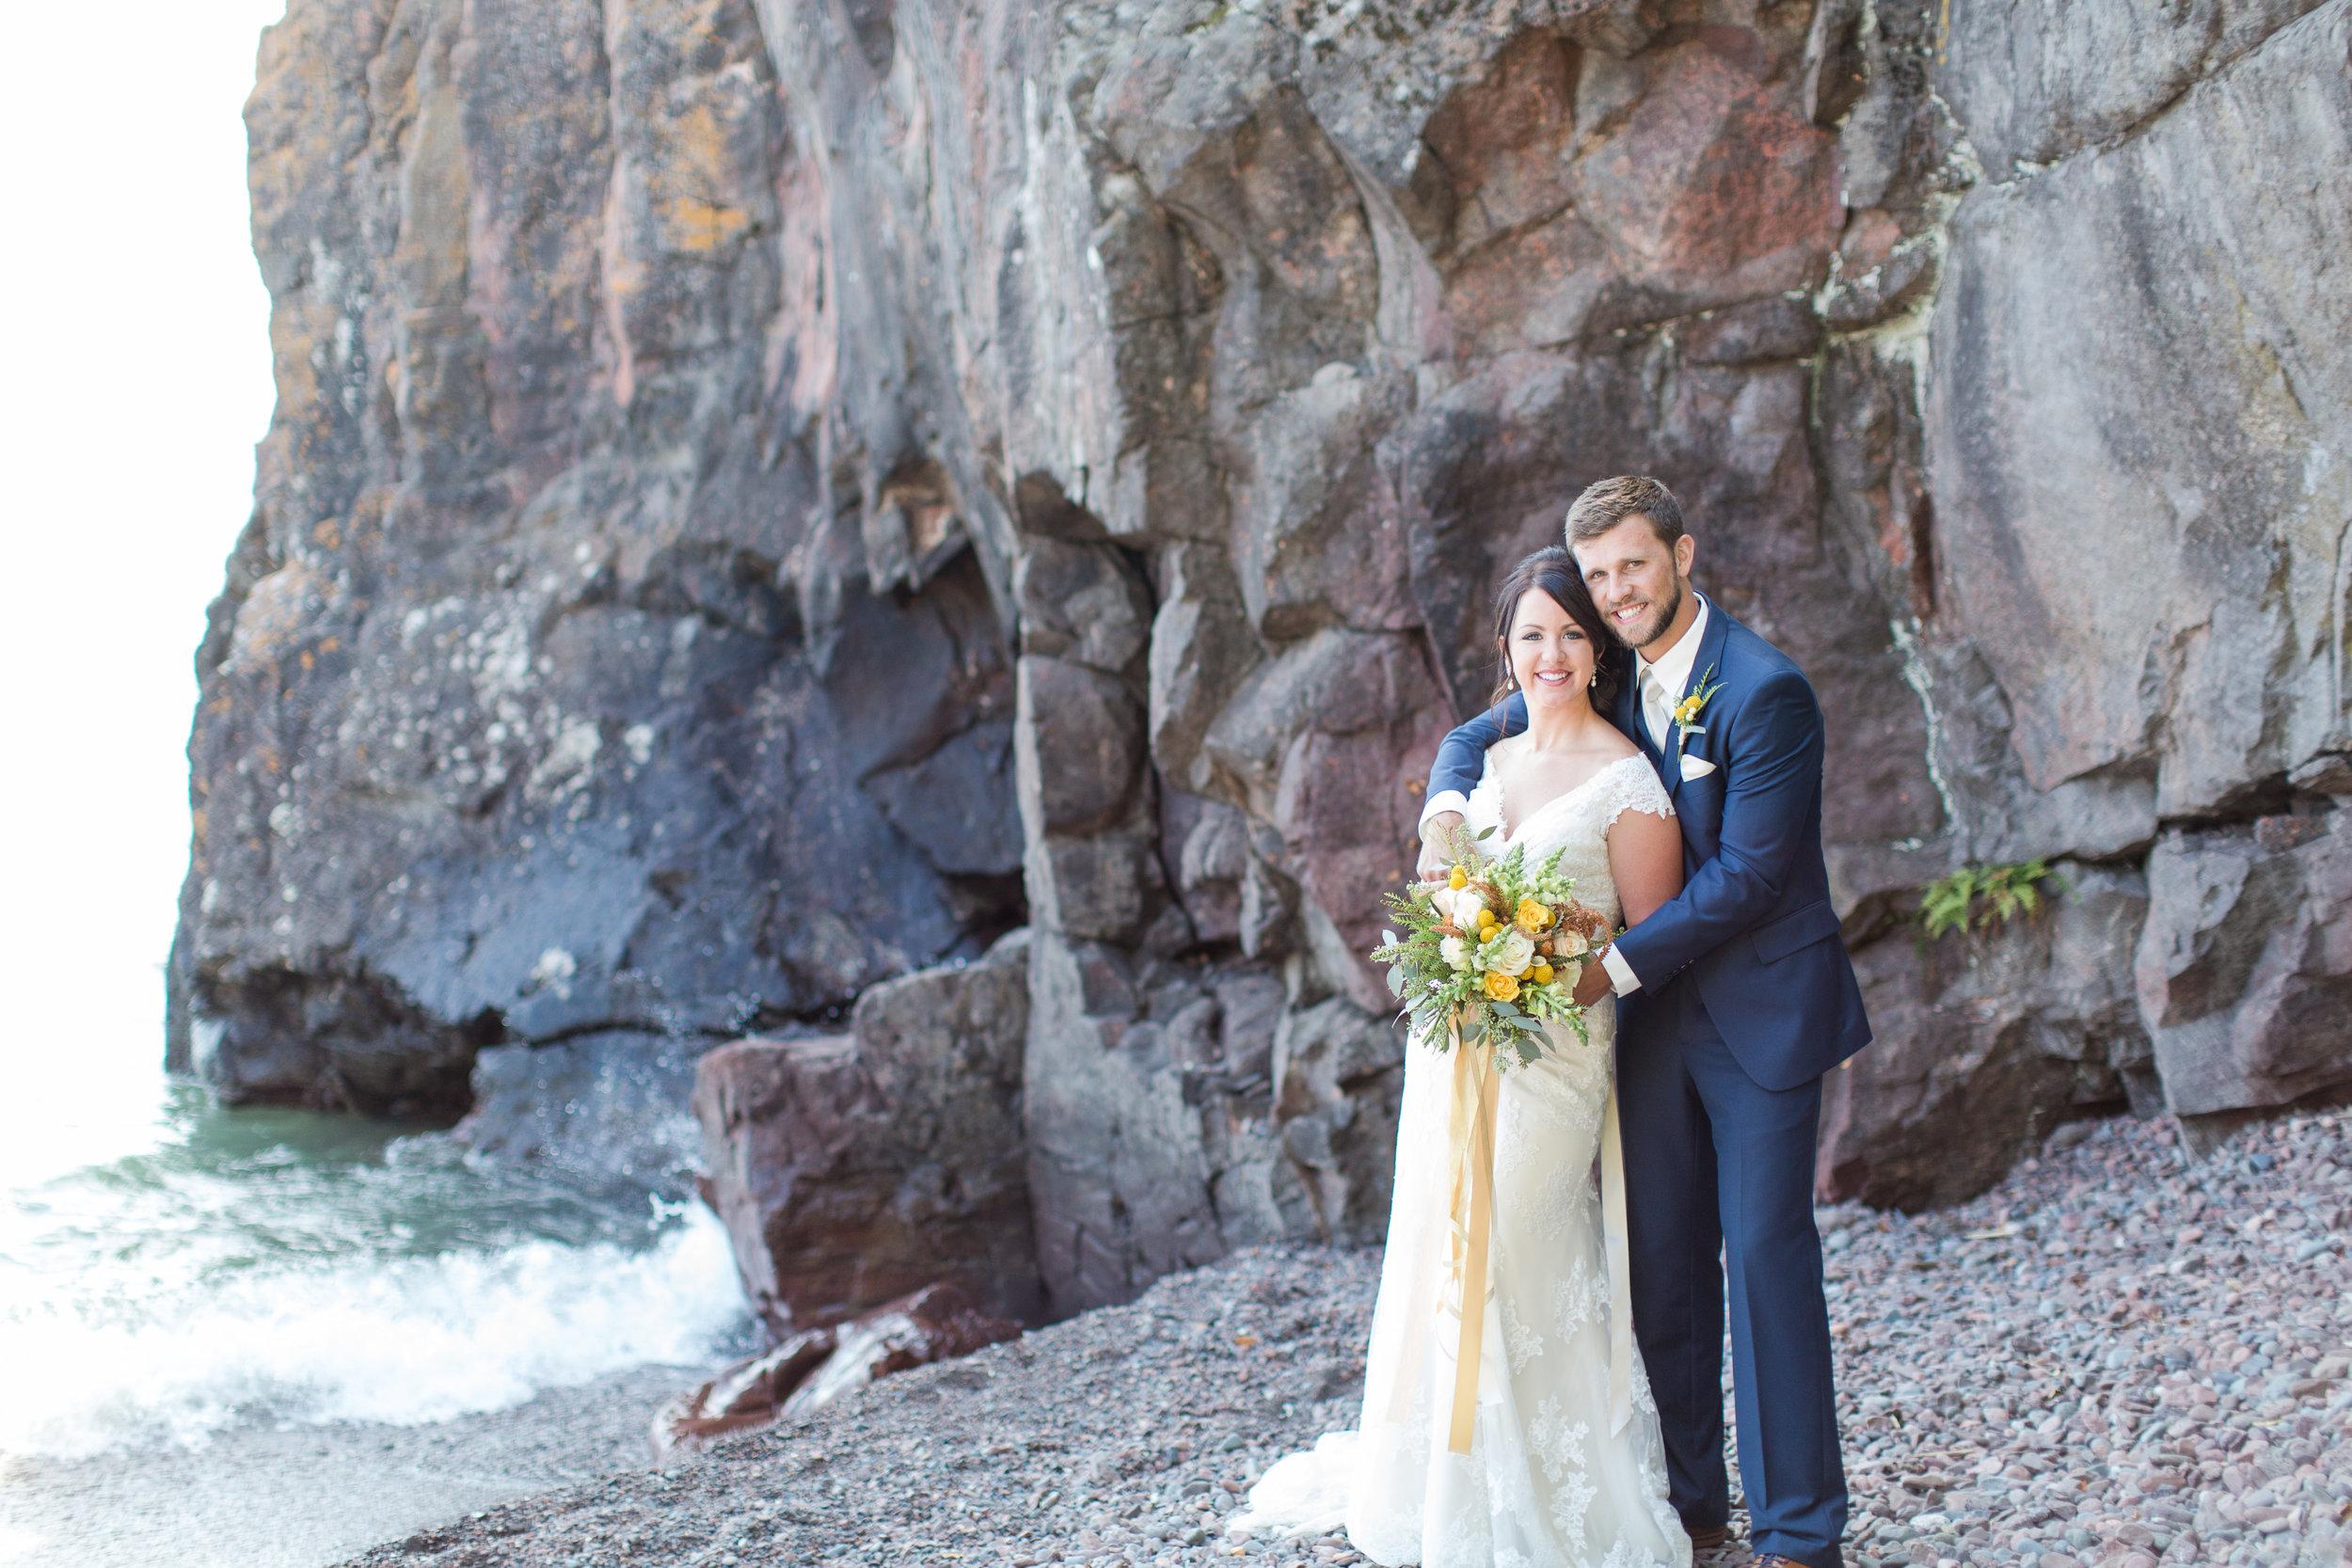 lutes wedding   kelsey + steven   mnweddingphotographer   mnweddings   north shore   lutsen   lake superior   wedding dress